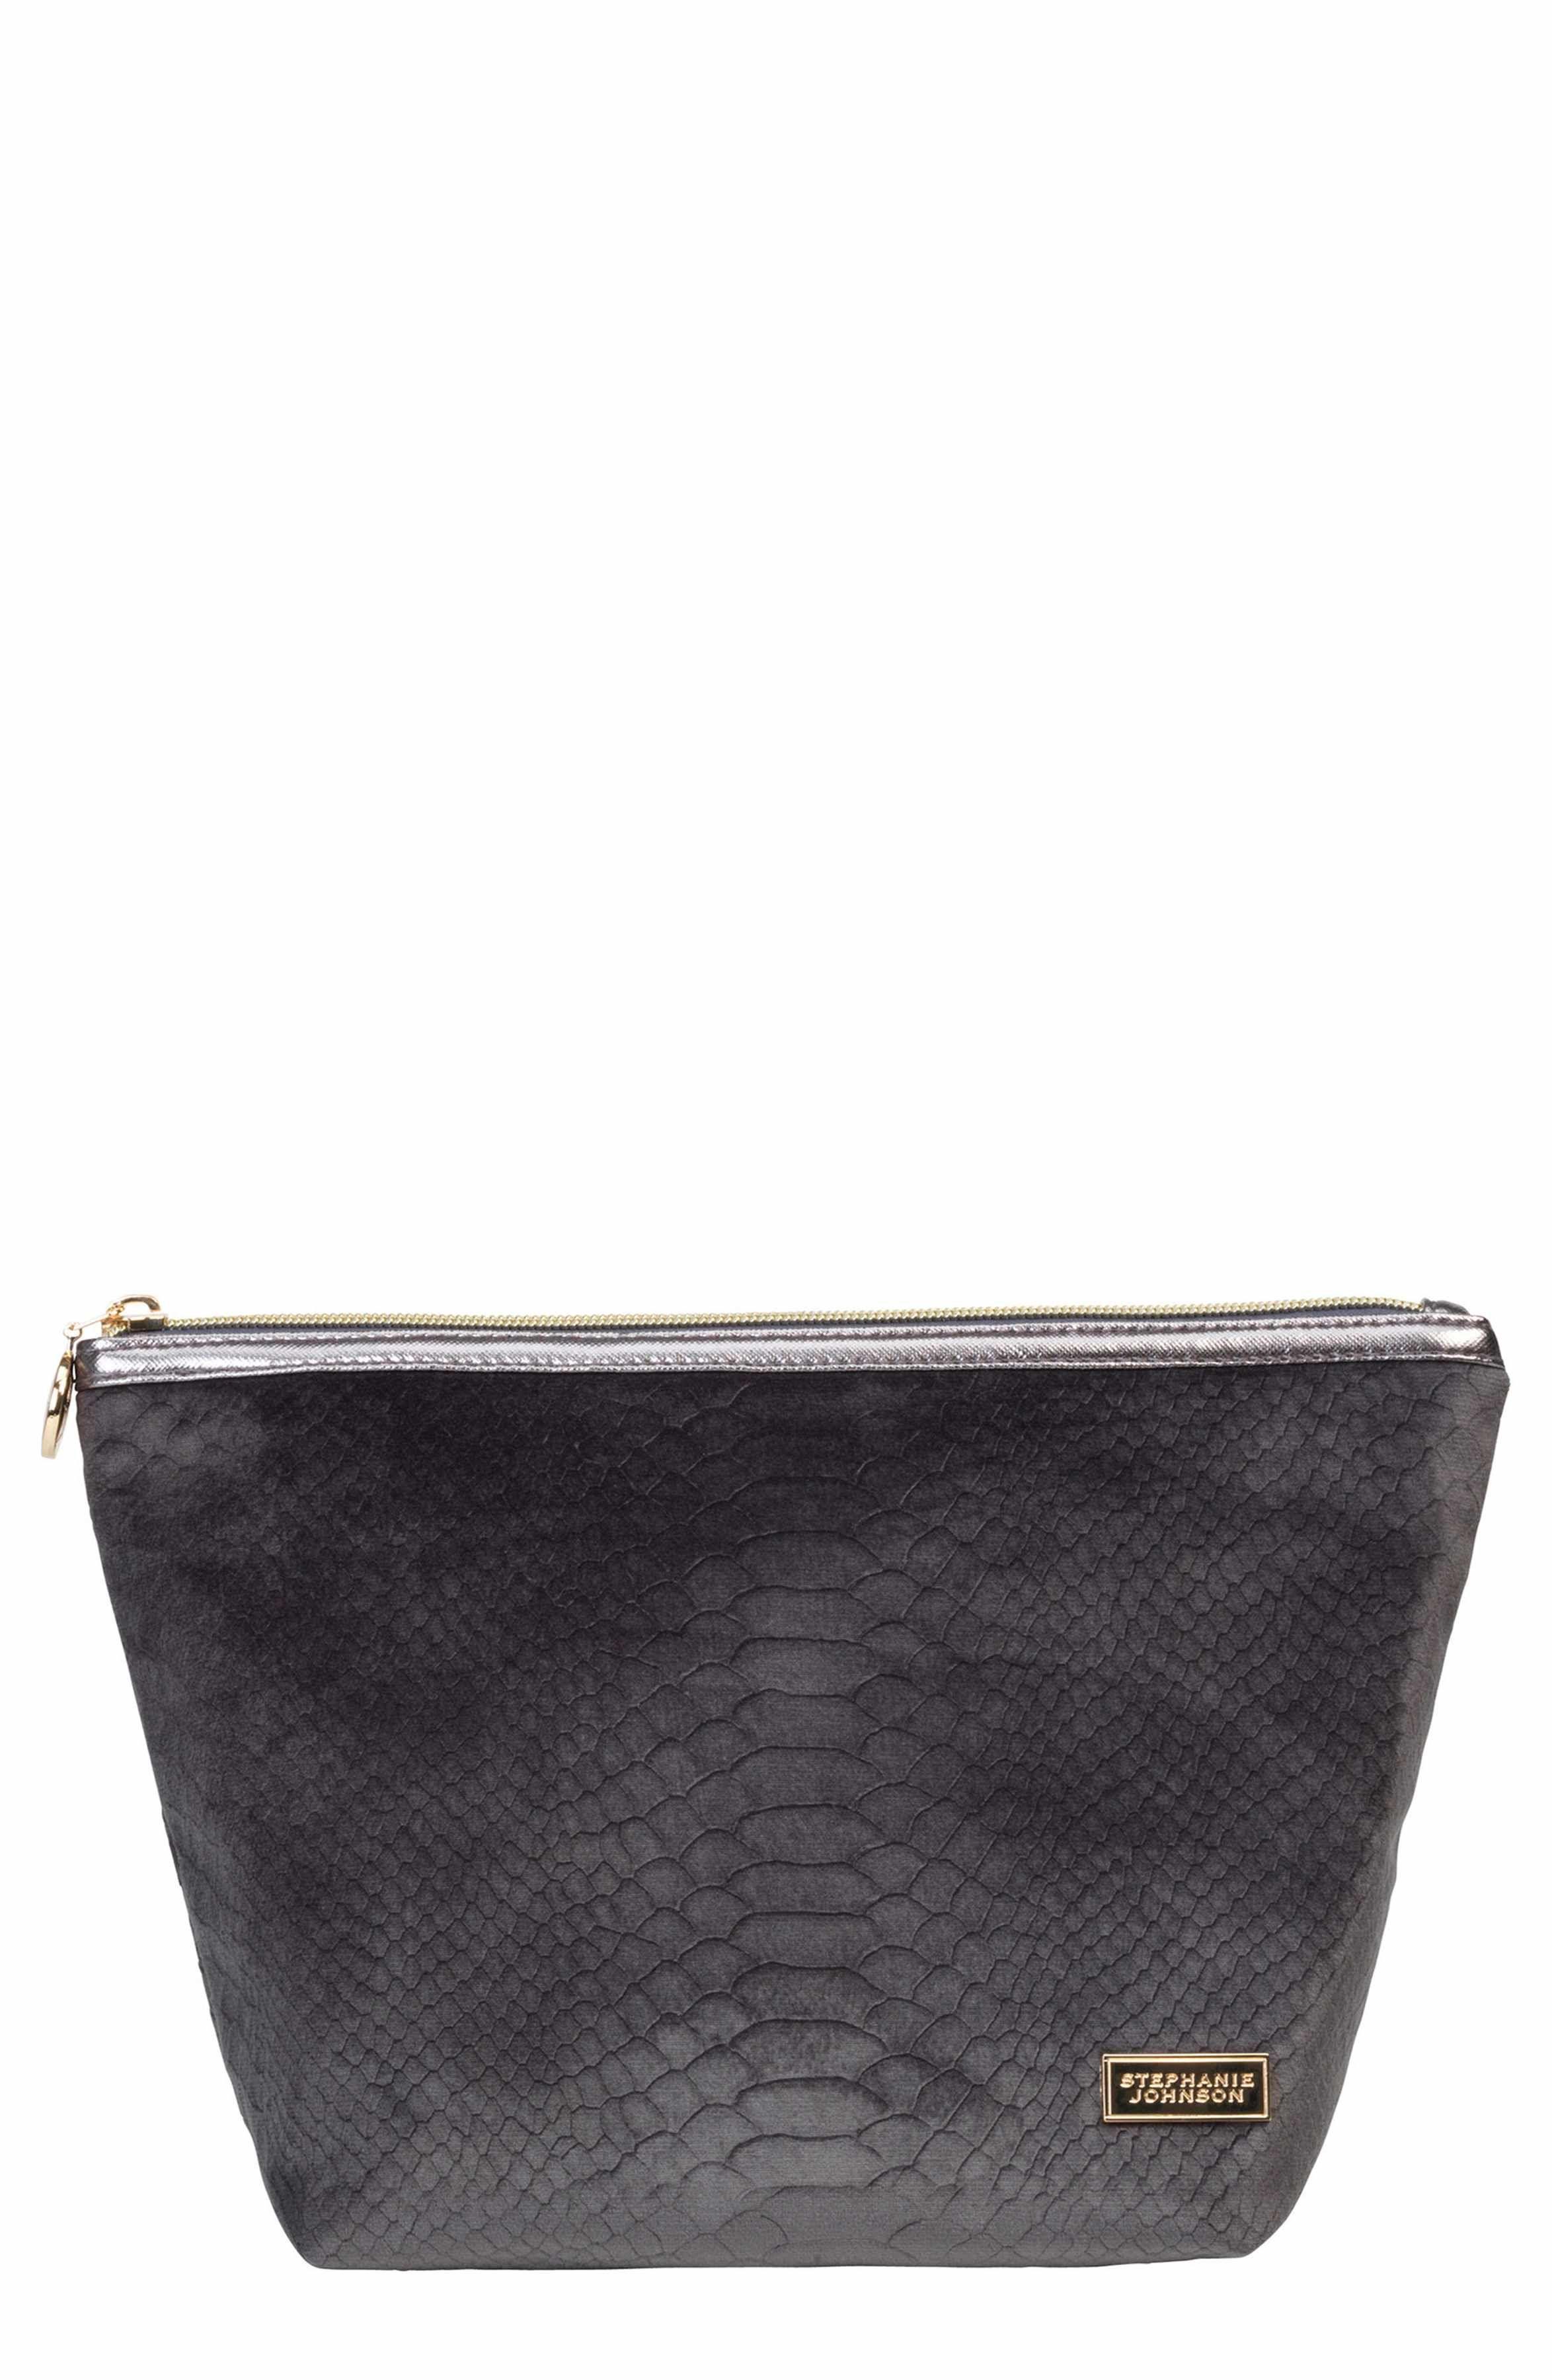 STEPHANIE JOHNSON .  stephaniejohnson  bags  cosmetic  accessories ... 42d9e3278b62c